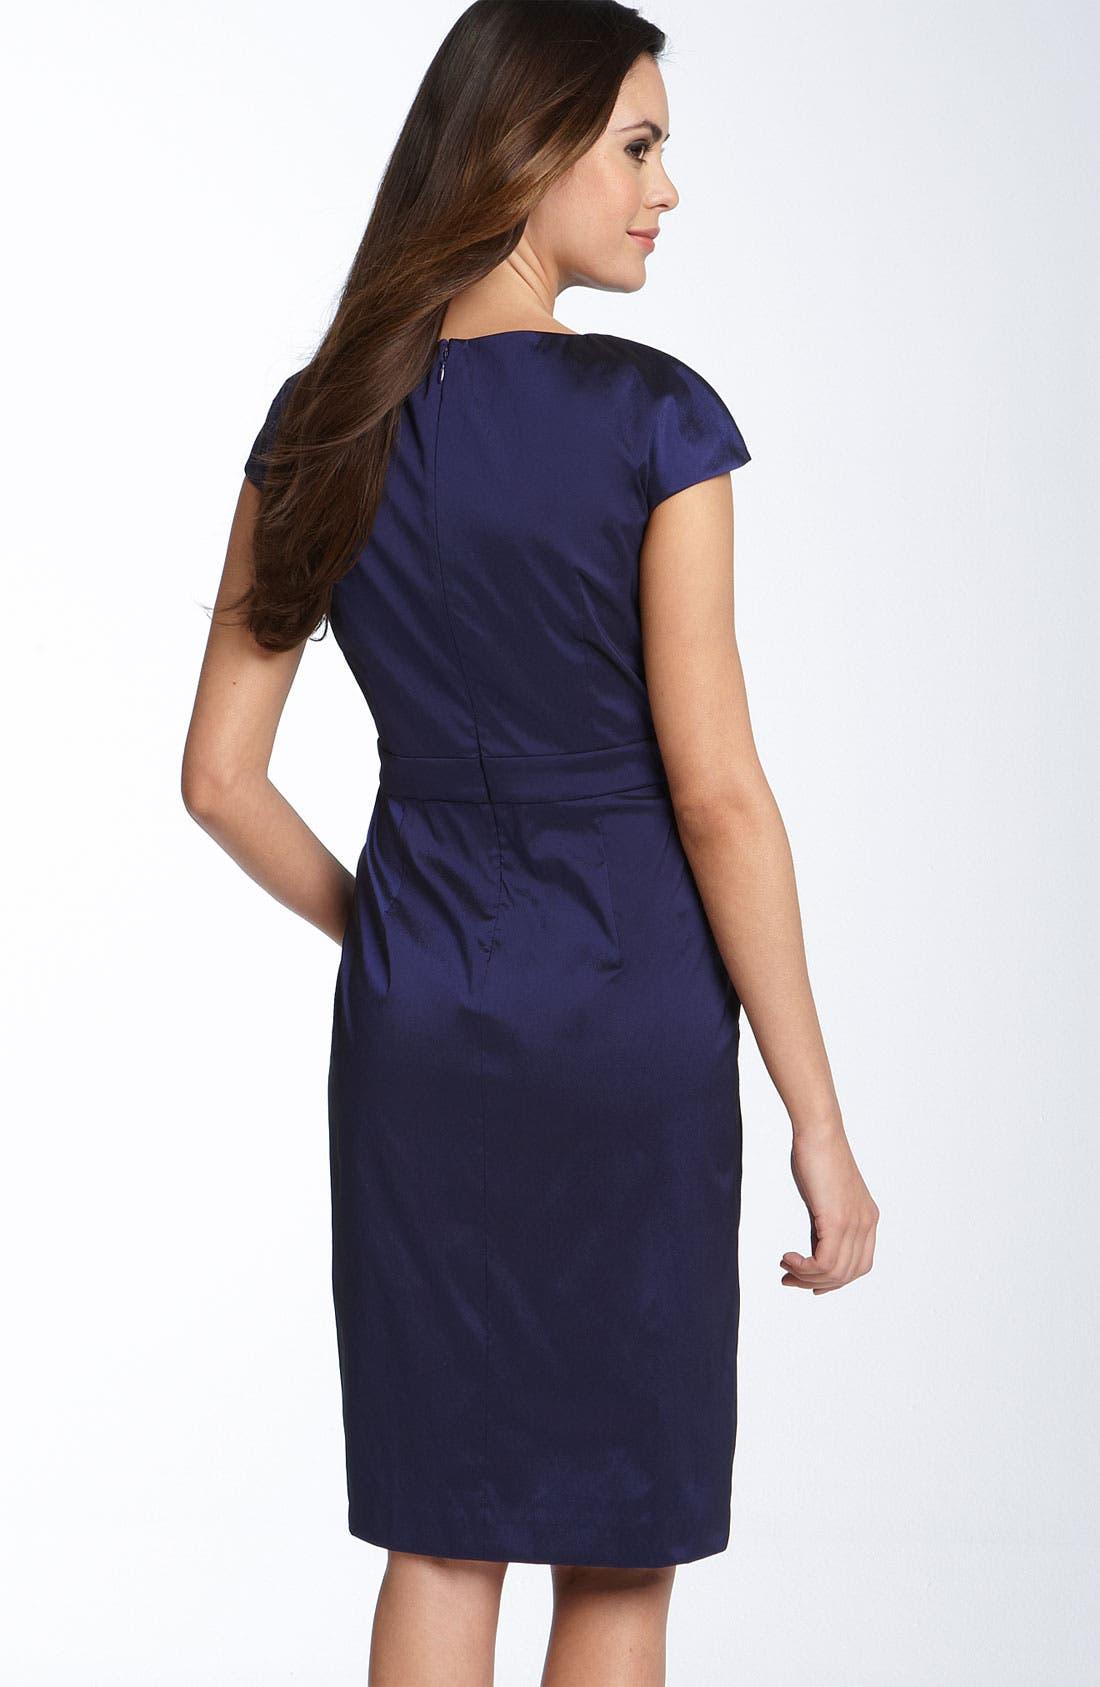 ELIZA J,                             Rhinestone Brooch Stretch Taffeta Sheath Dress,                             Alternate thumbnail 2, color,                             402